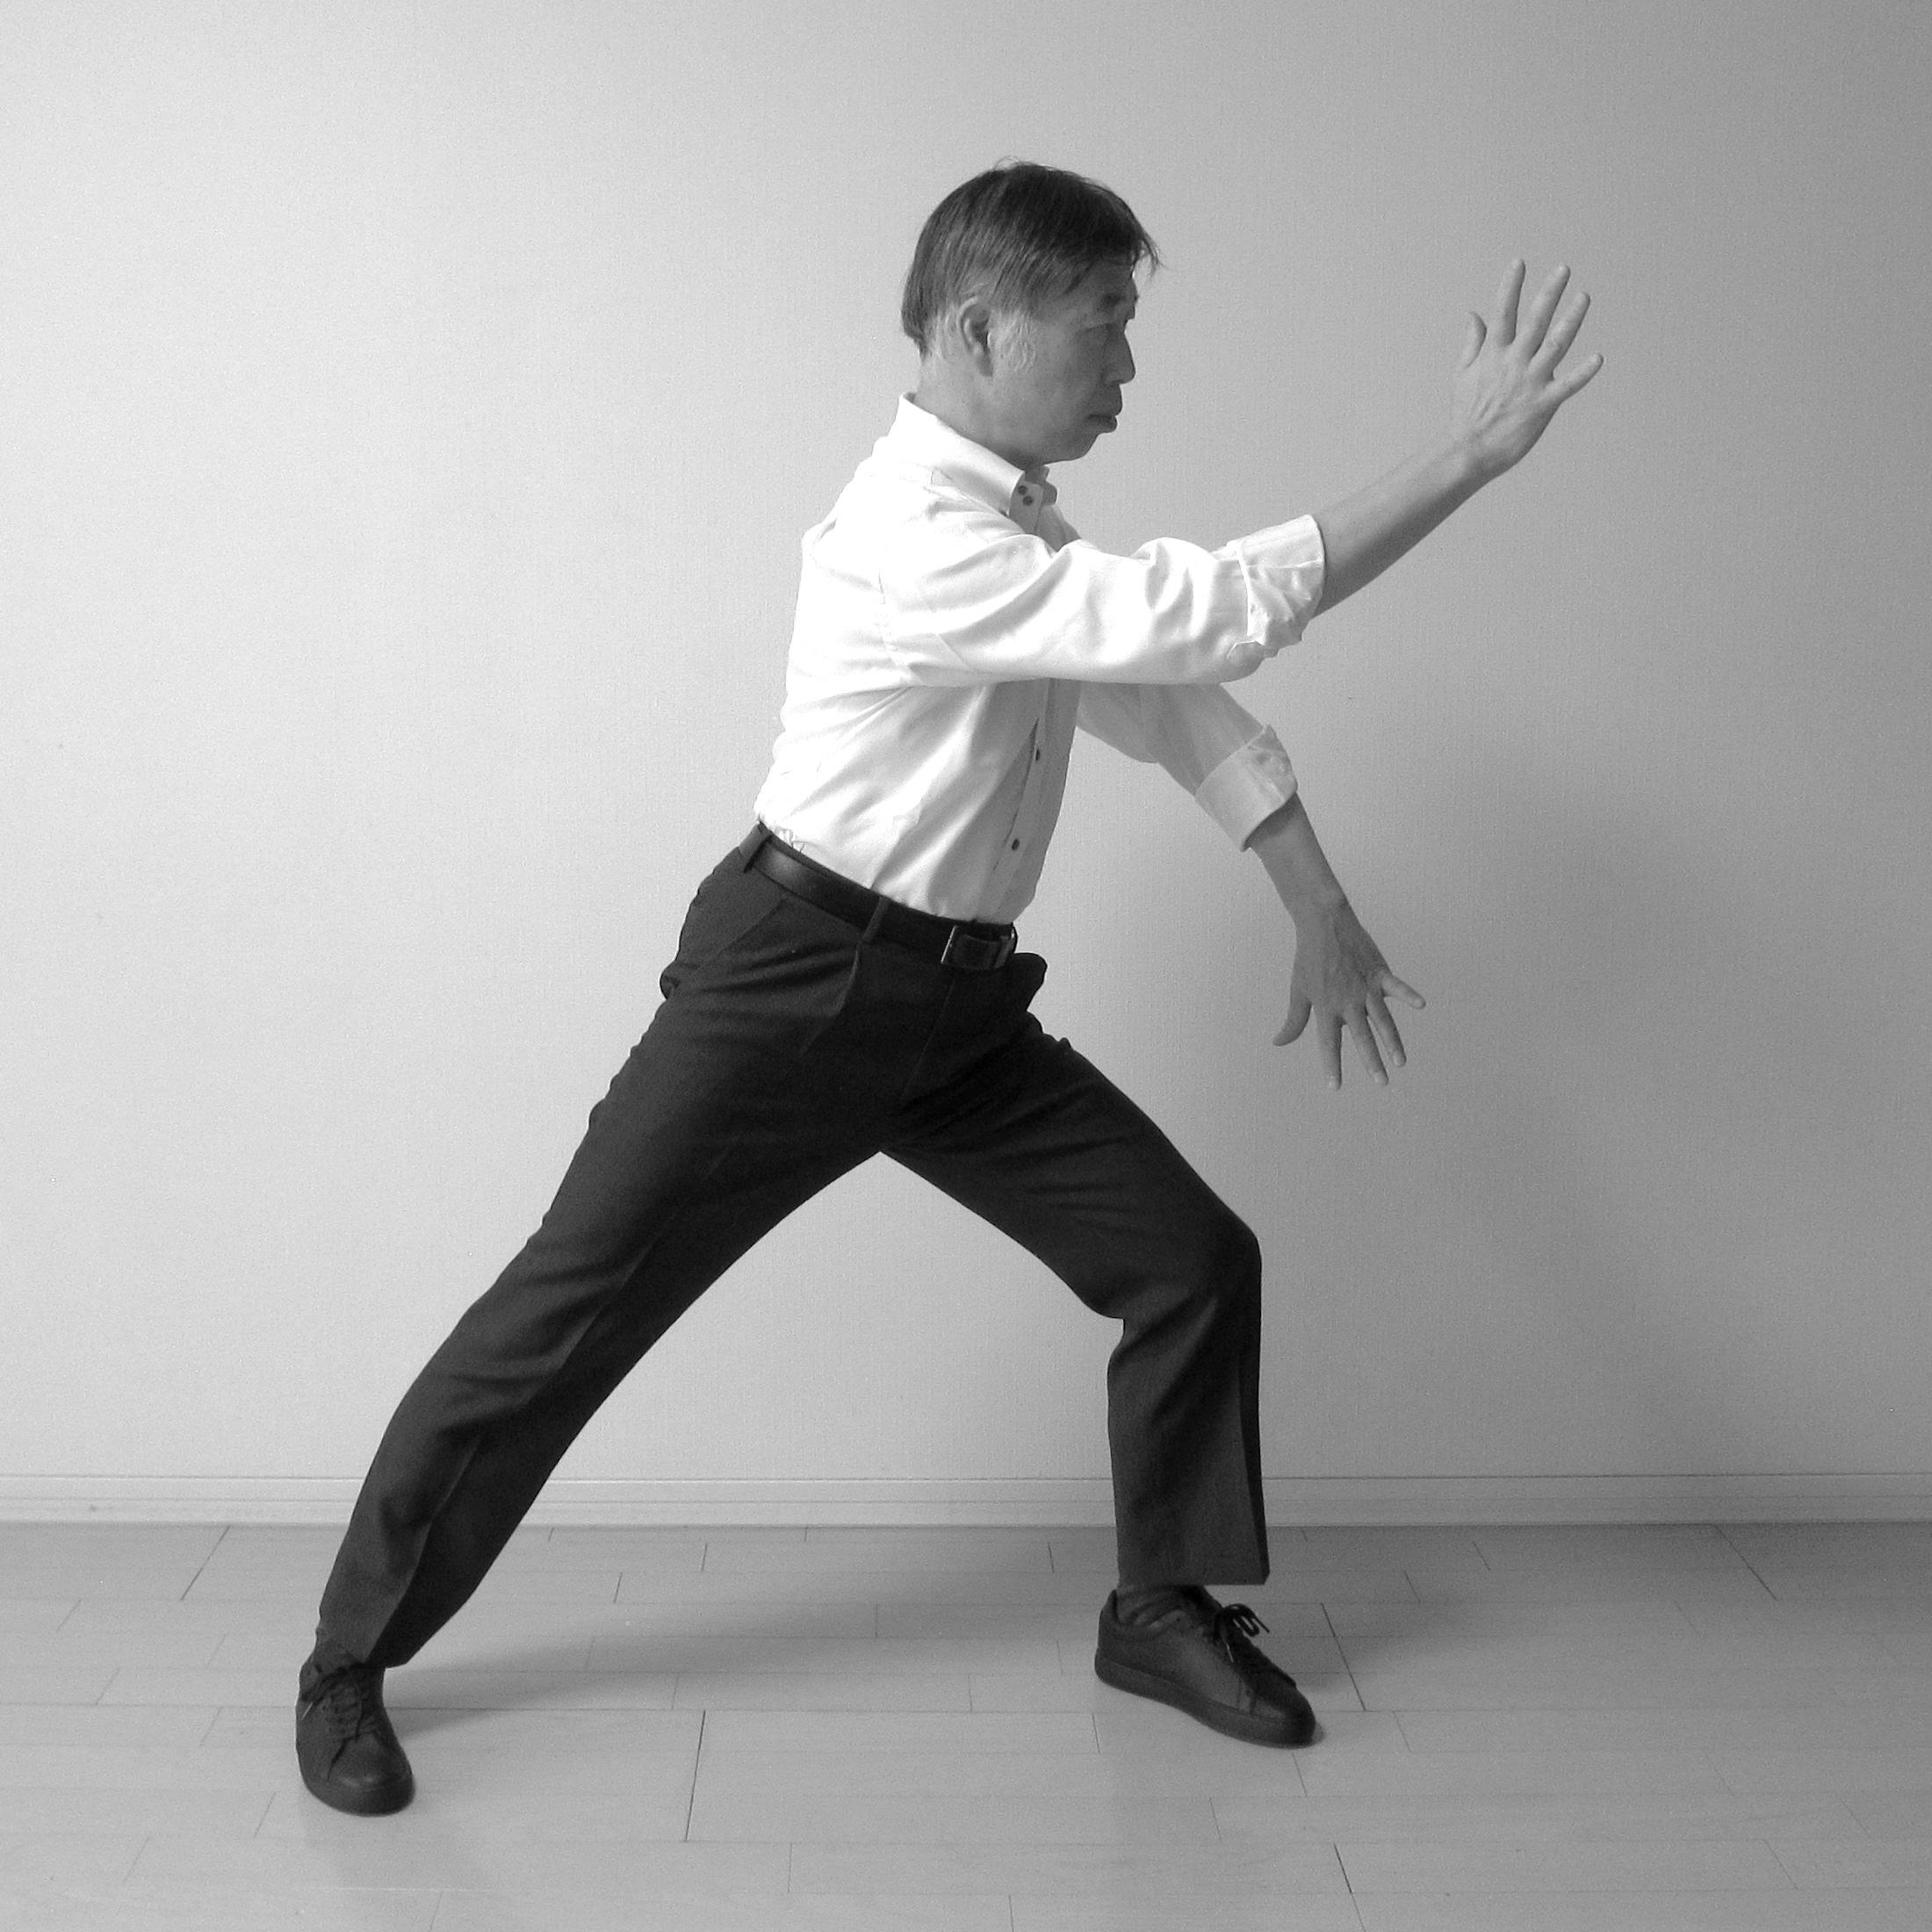 Taichi Bow Stance